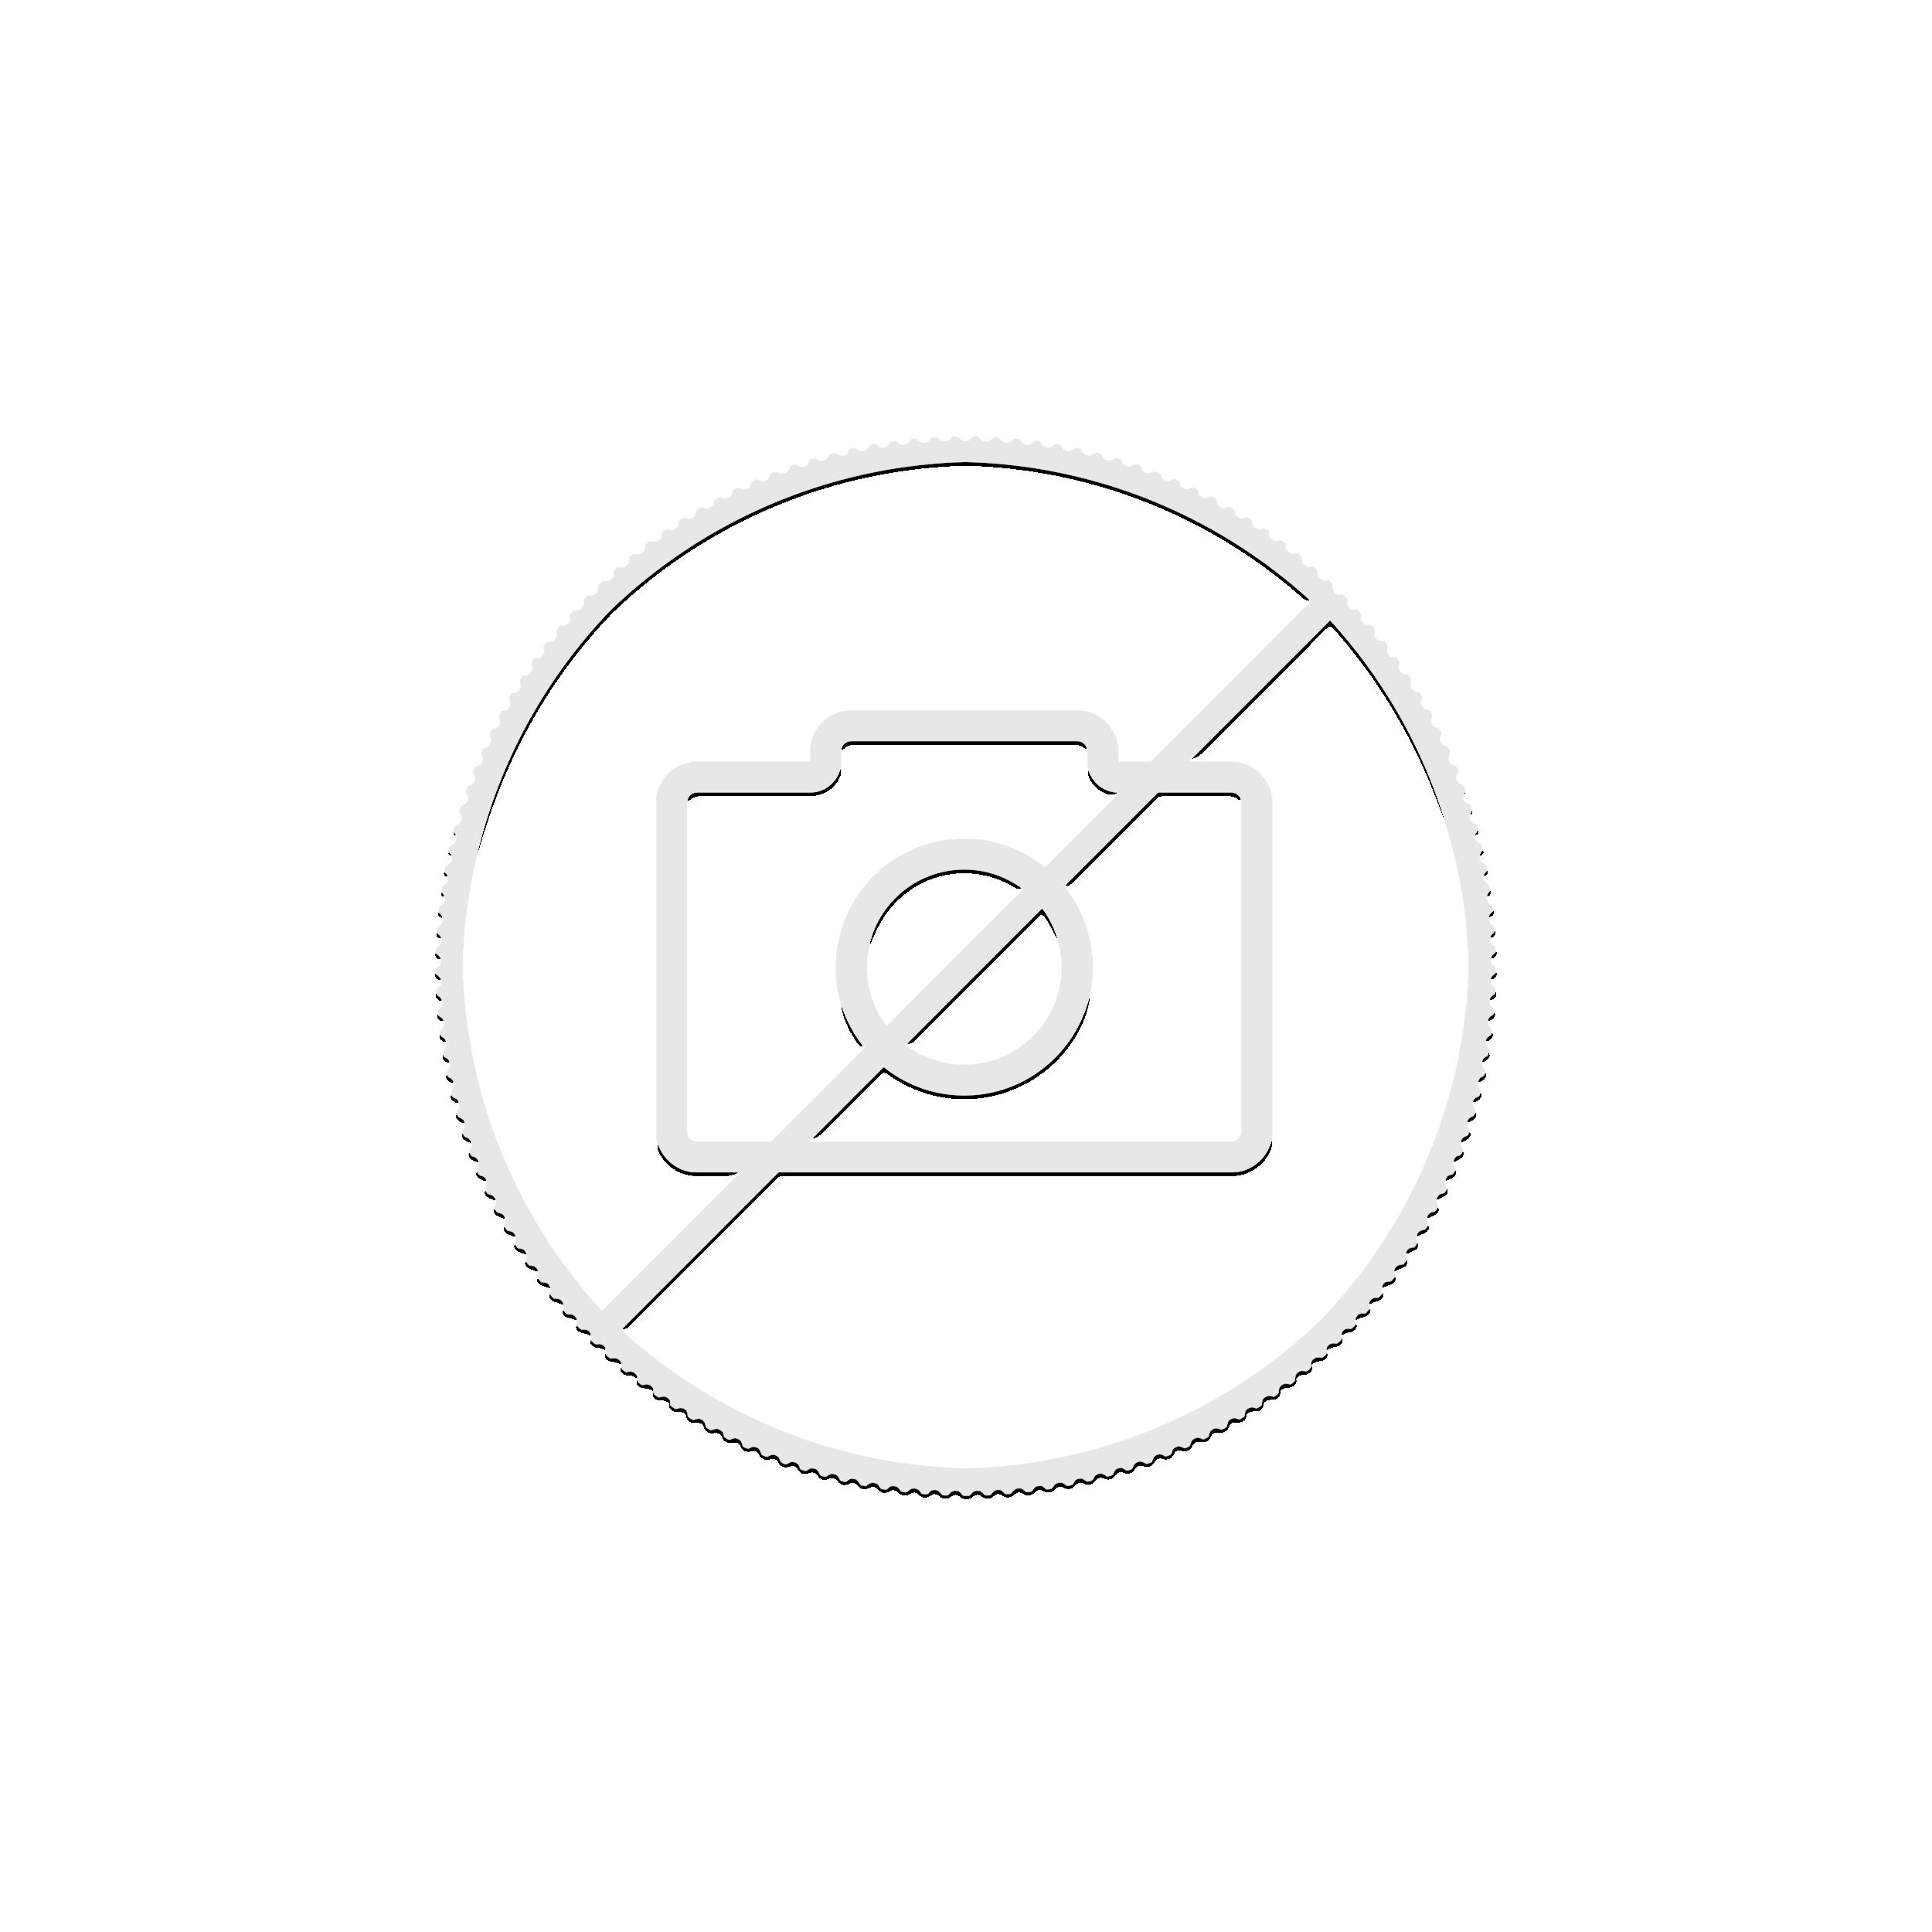 10 Troy ounce zilveren munt Maple Leaf 2017